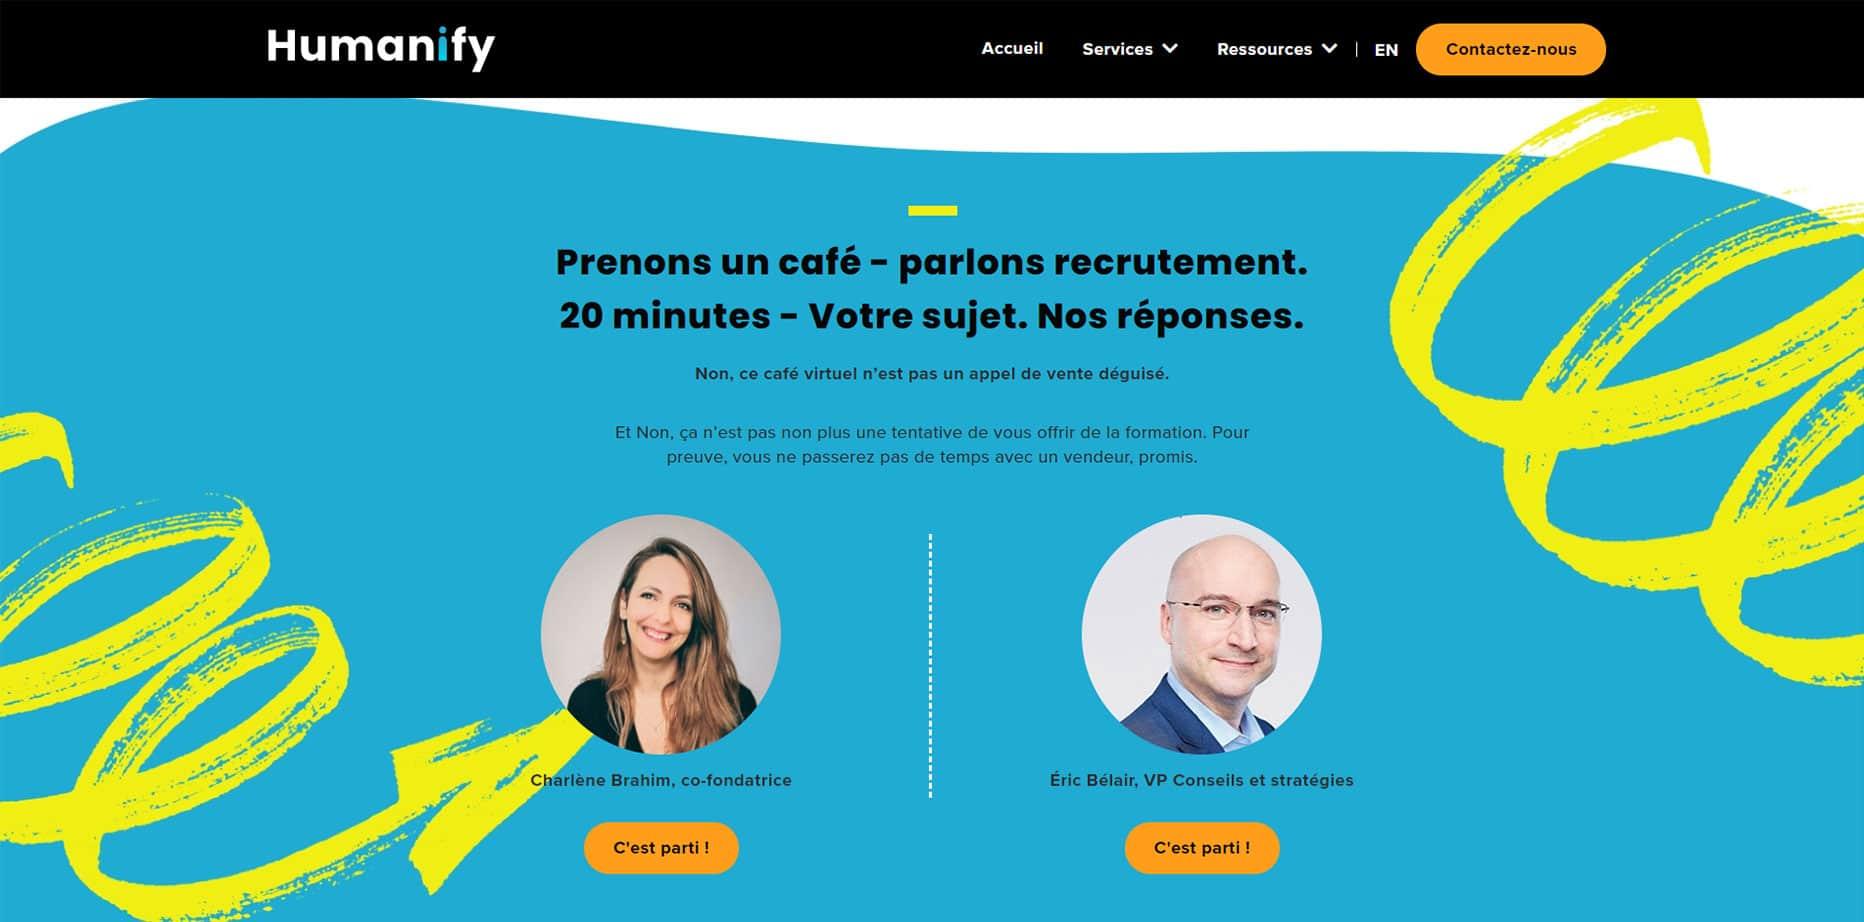 Humanify 360 - 6